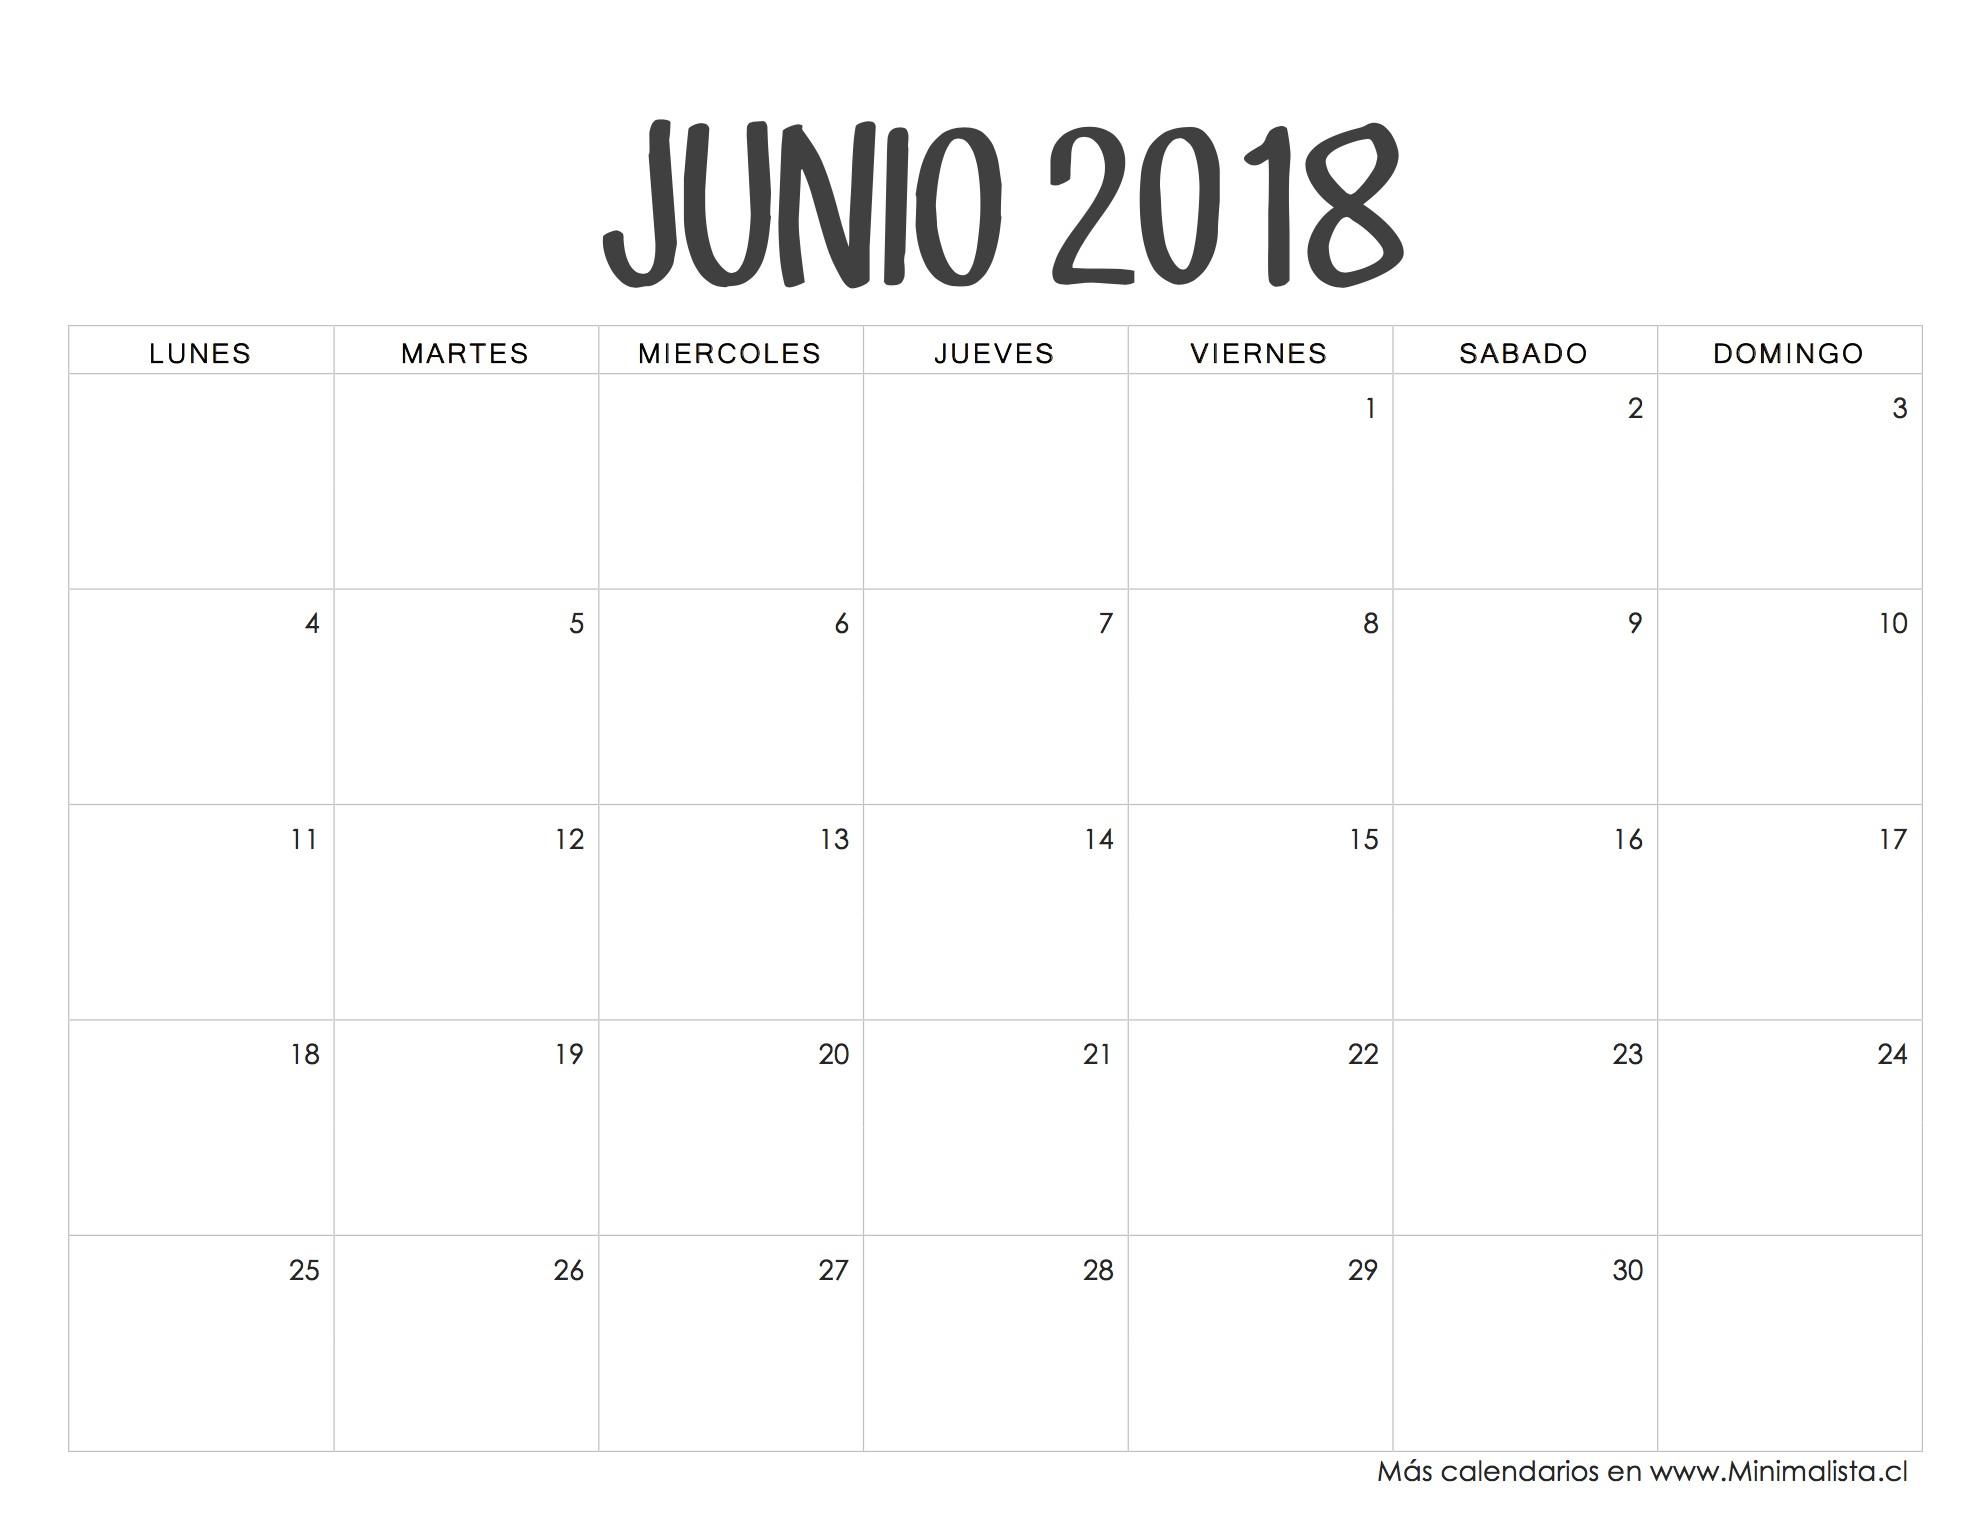 Calendario Junio 2018 Agenda Planner Dyi Scrapbook Bullet Journal Journal Ideas